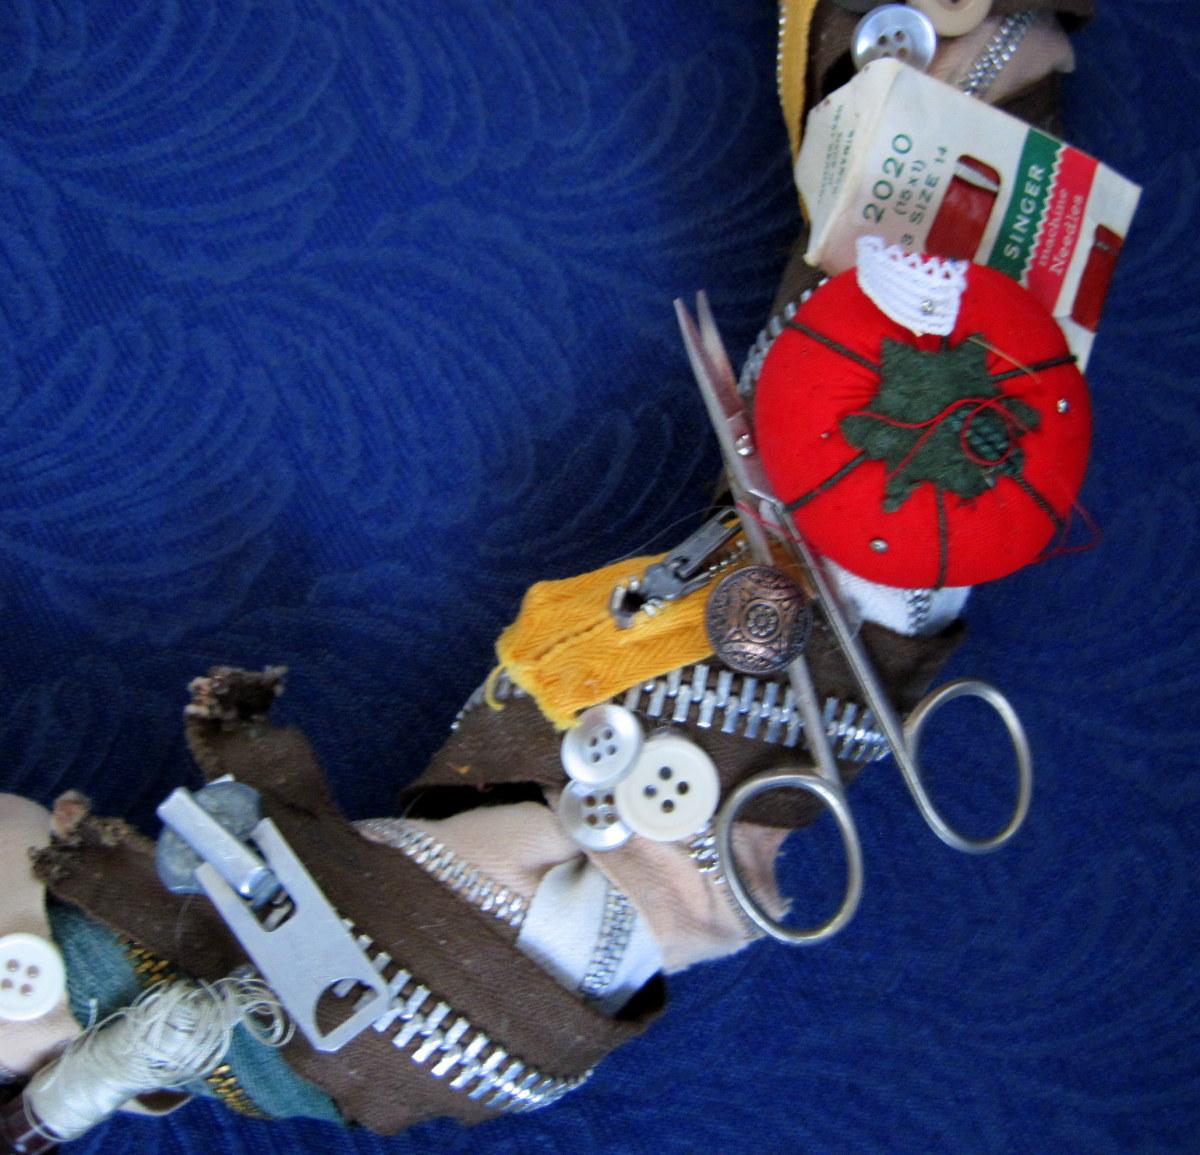 Grandma's Sewing Box Wreath (detail)